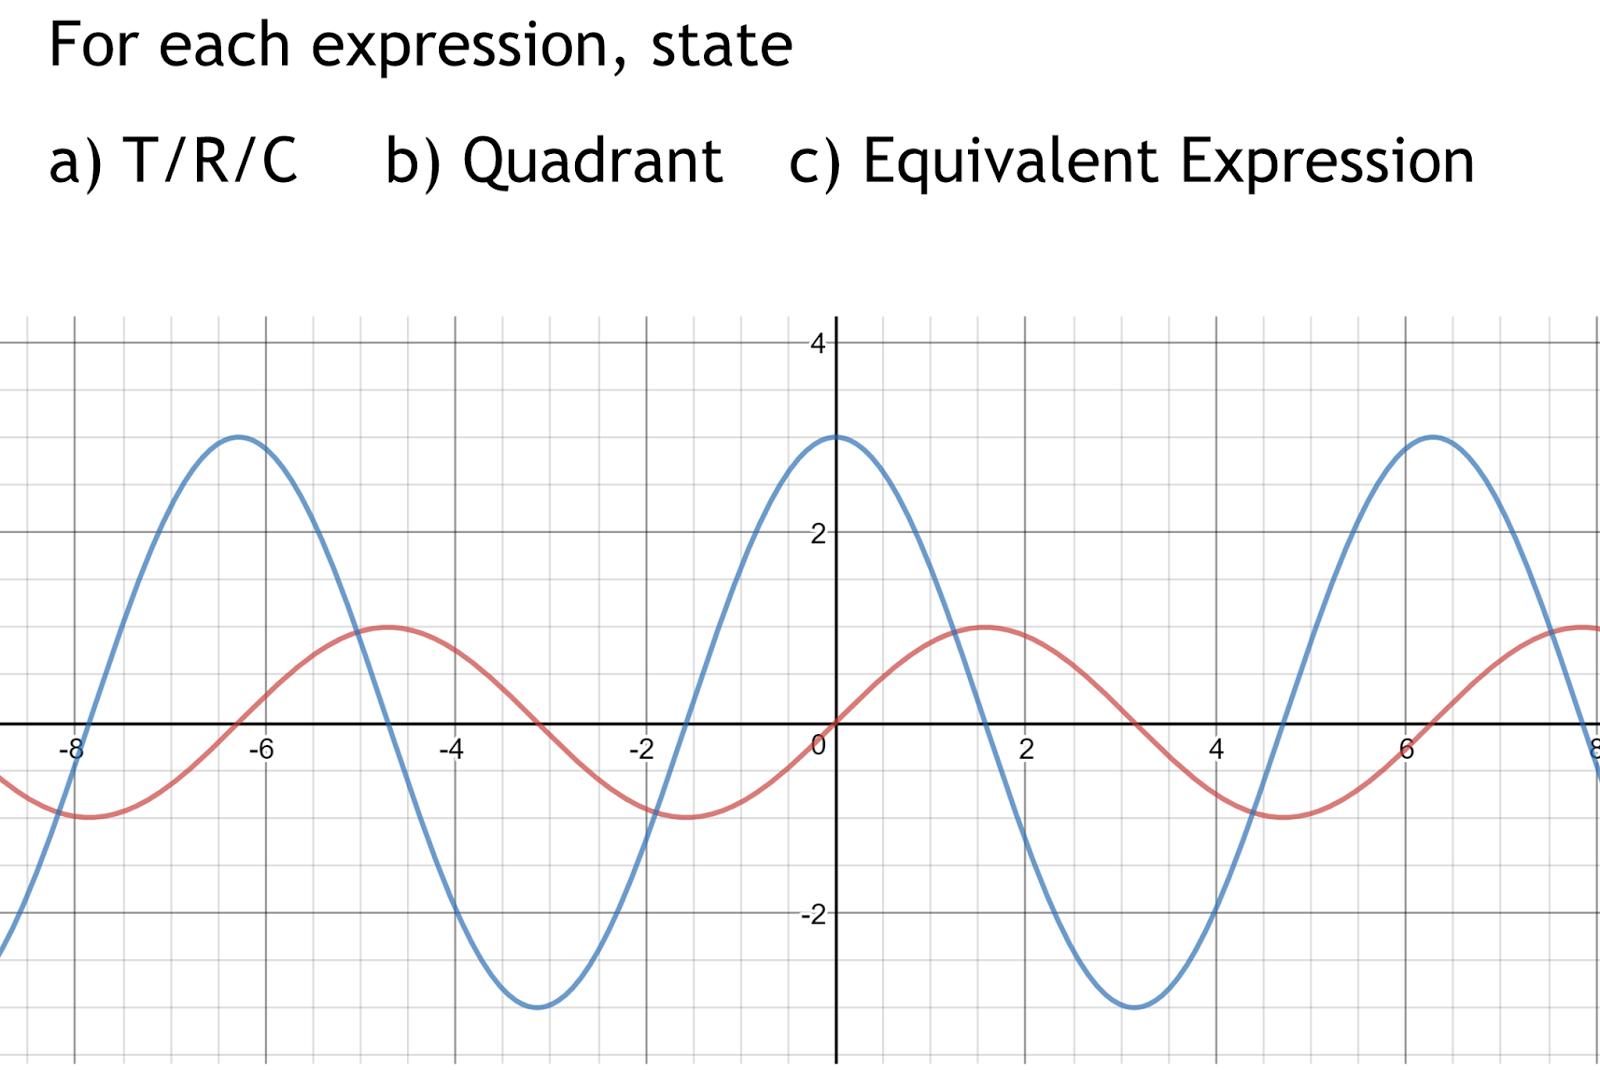 worksheet Printable Quadrant Graph Paper 1st quadrant graph paper maths translation worksheet blank numerator and denominator game3 blankhtml